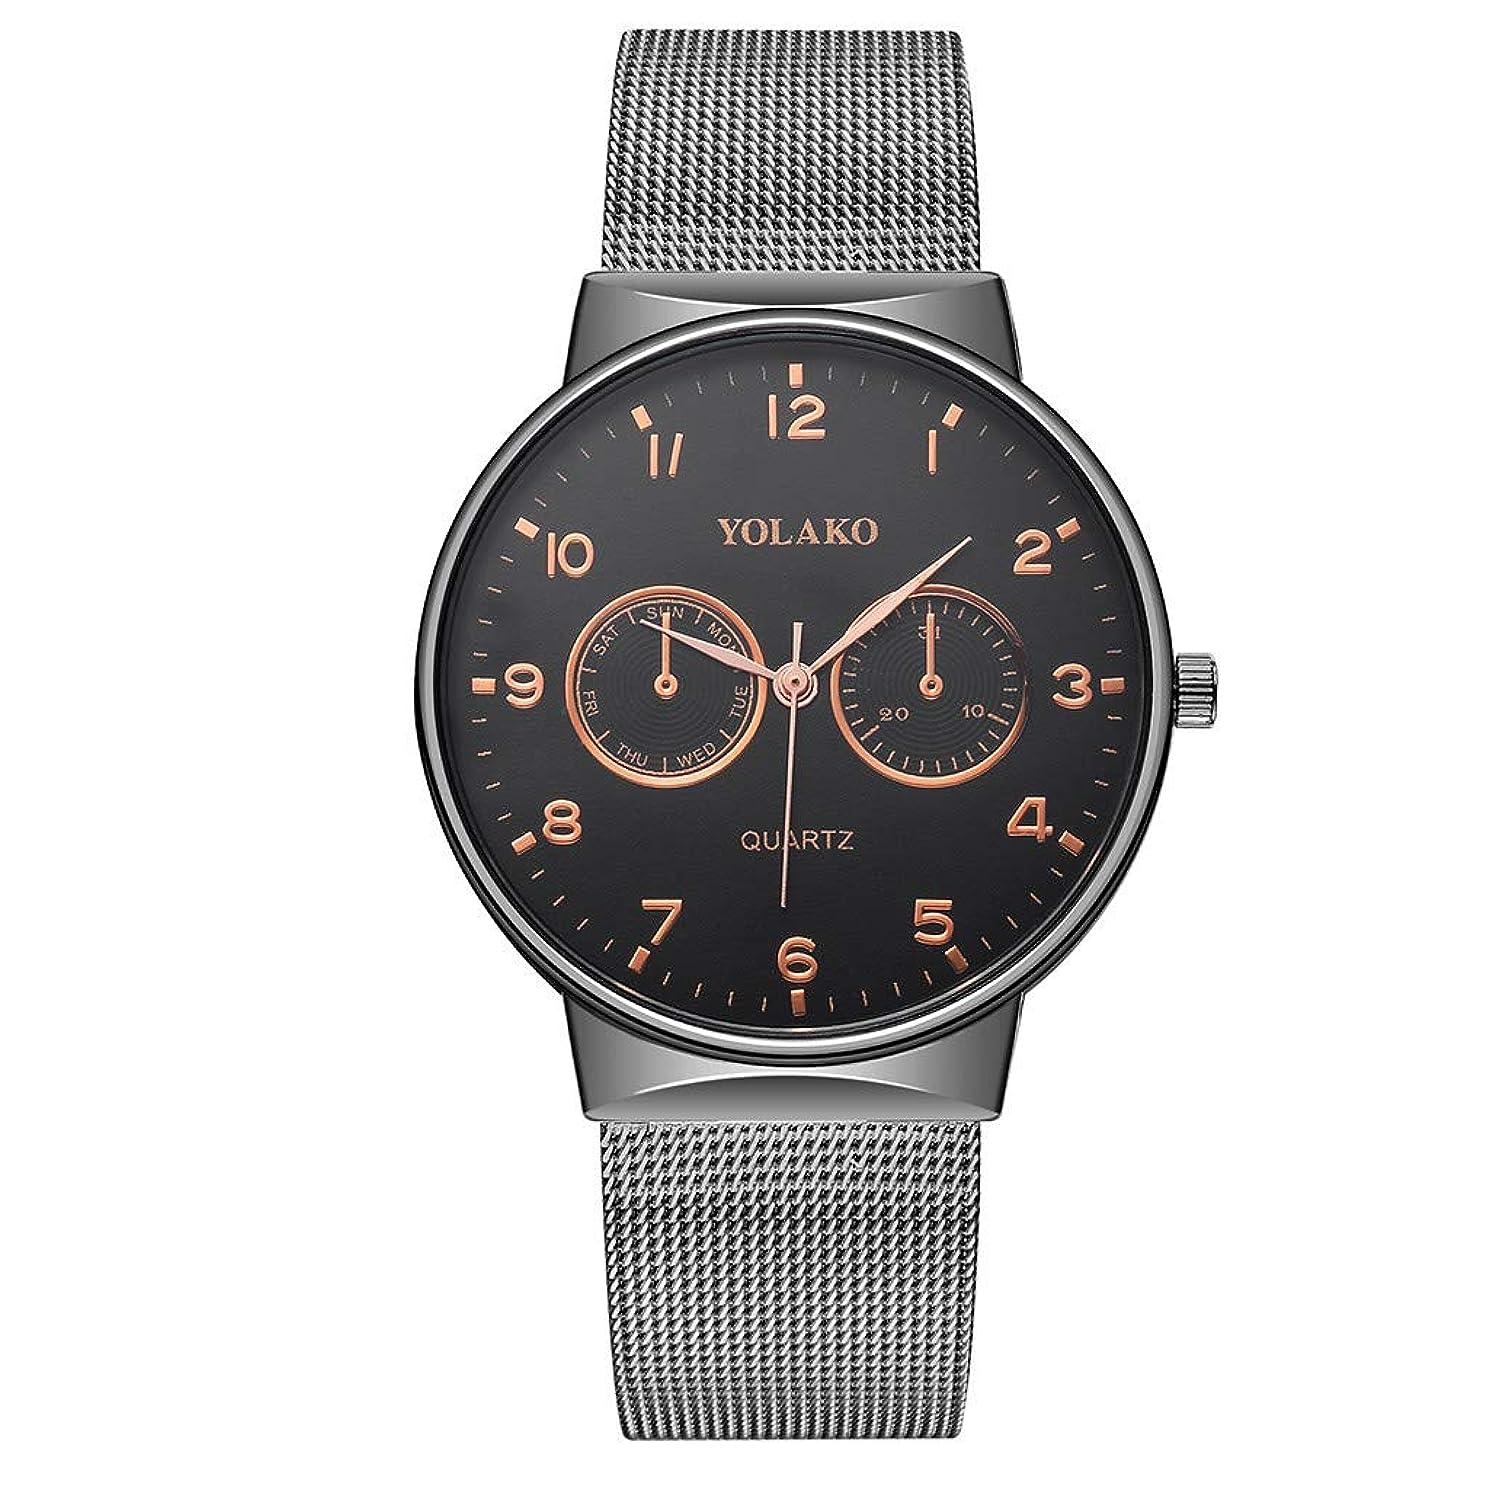 Guartz Watches for Men Digital Under 10 Dollars ? YOLAKO Men's Quartz Stainless Steel Band Newv Strap Watch Analog Wrist Watch